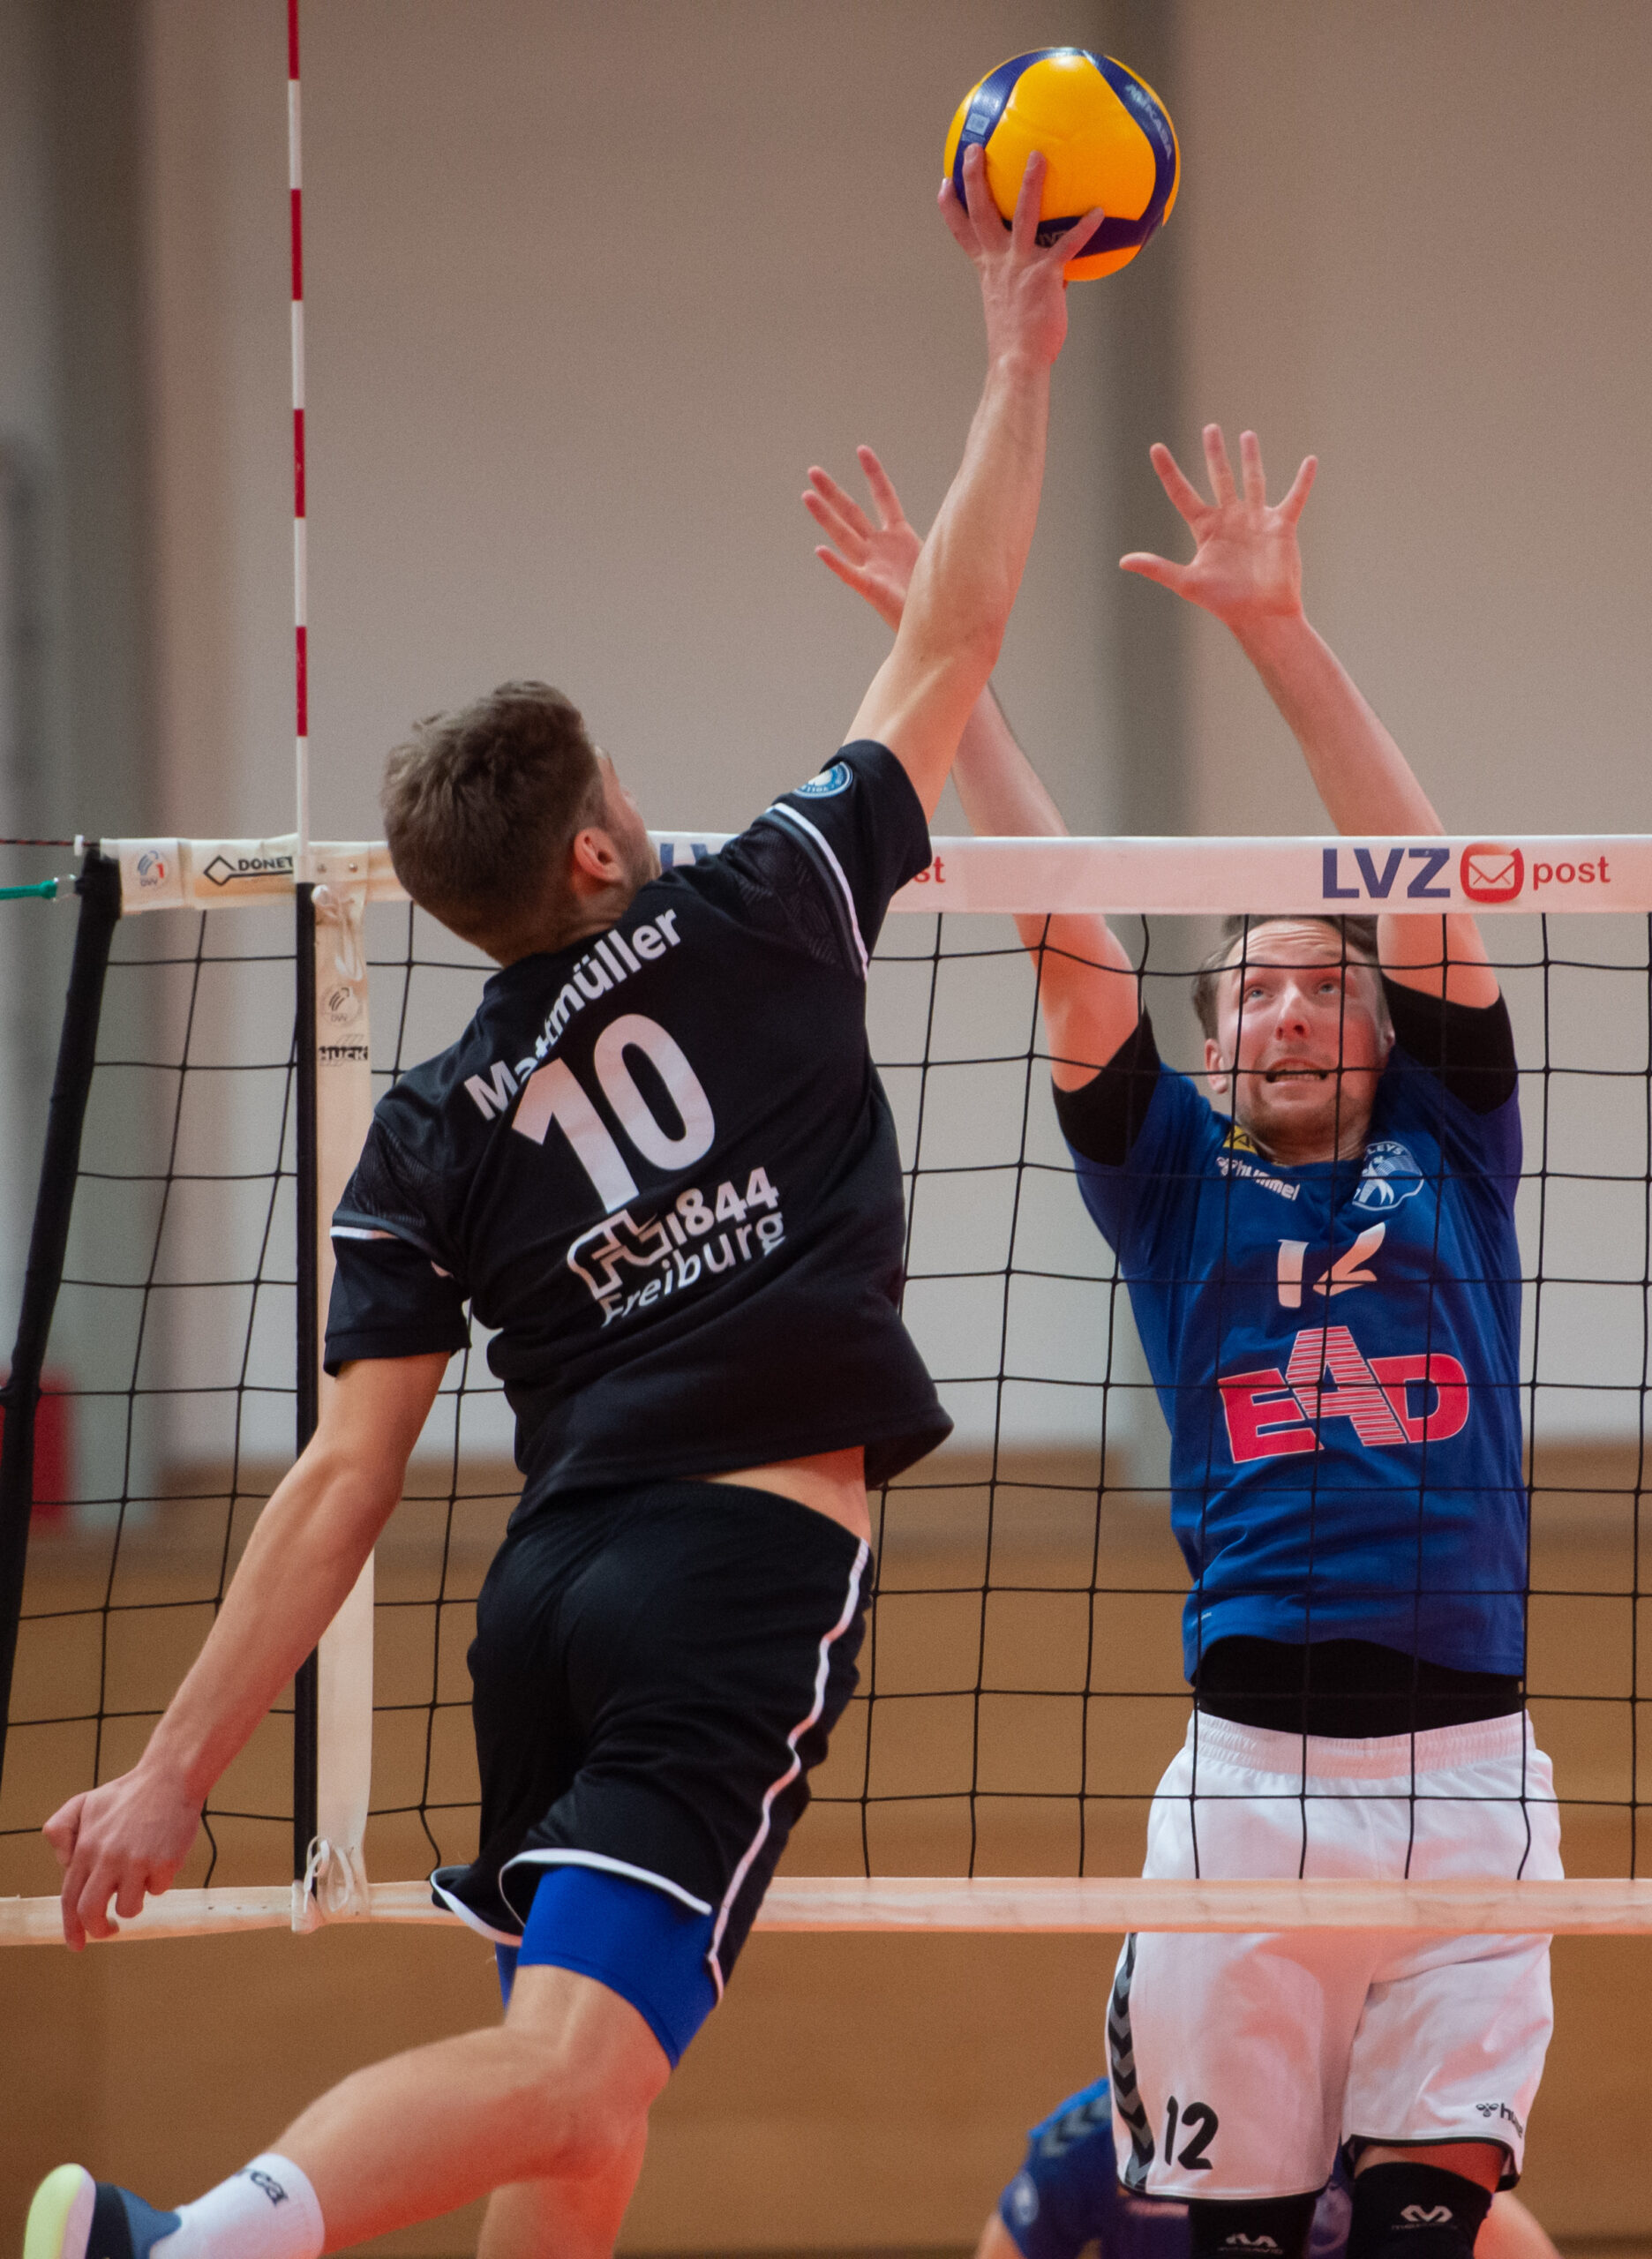 Martin  Burgartz (Volleys #12) im Block gegen Mathis Mattmüller   L.E. Volleys Leipzig vs FT 1844 Freiburg, Volleyball, 2.Liga, 13.03.2021